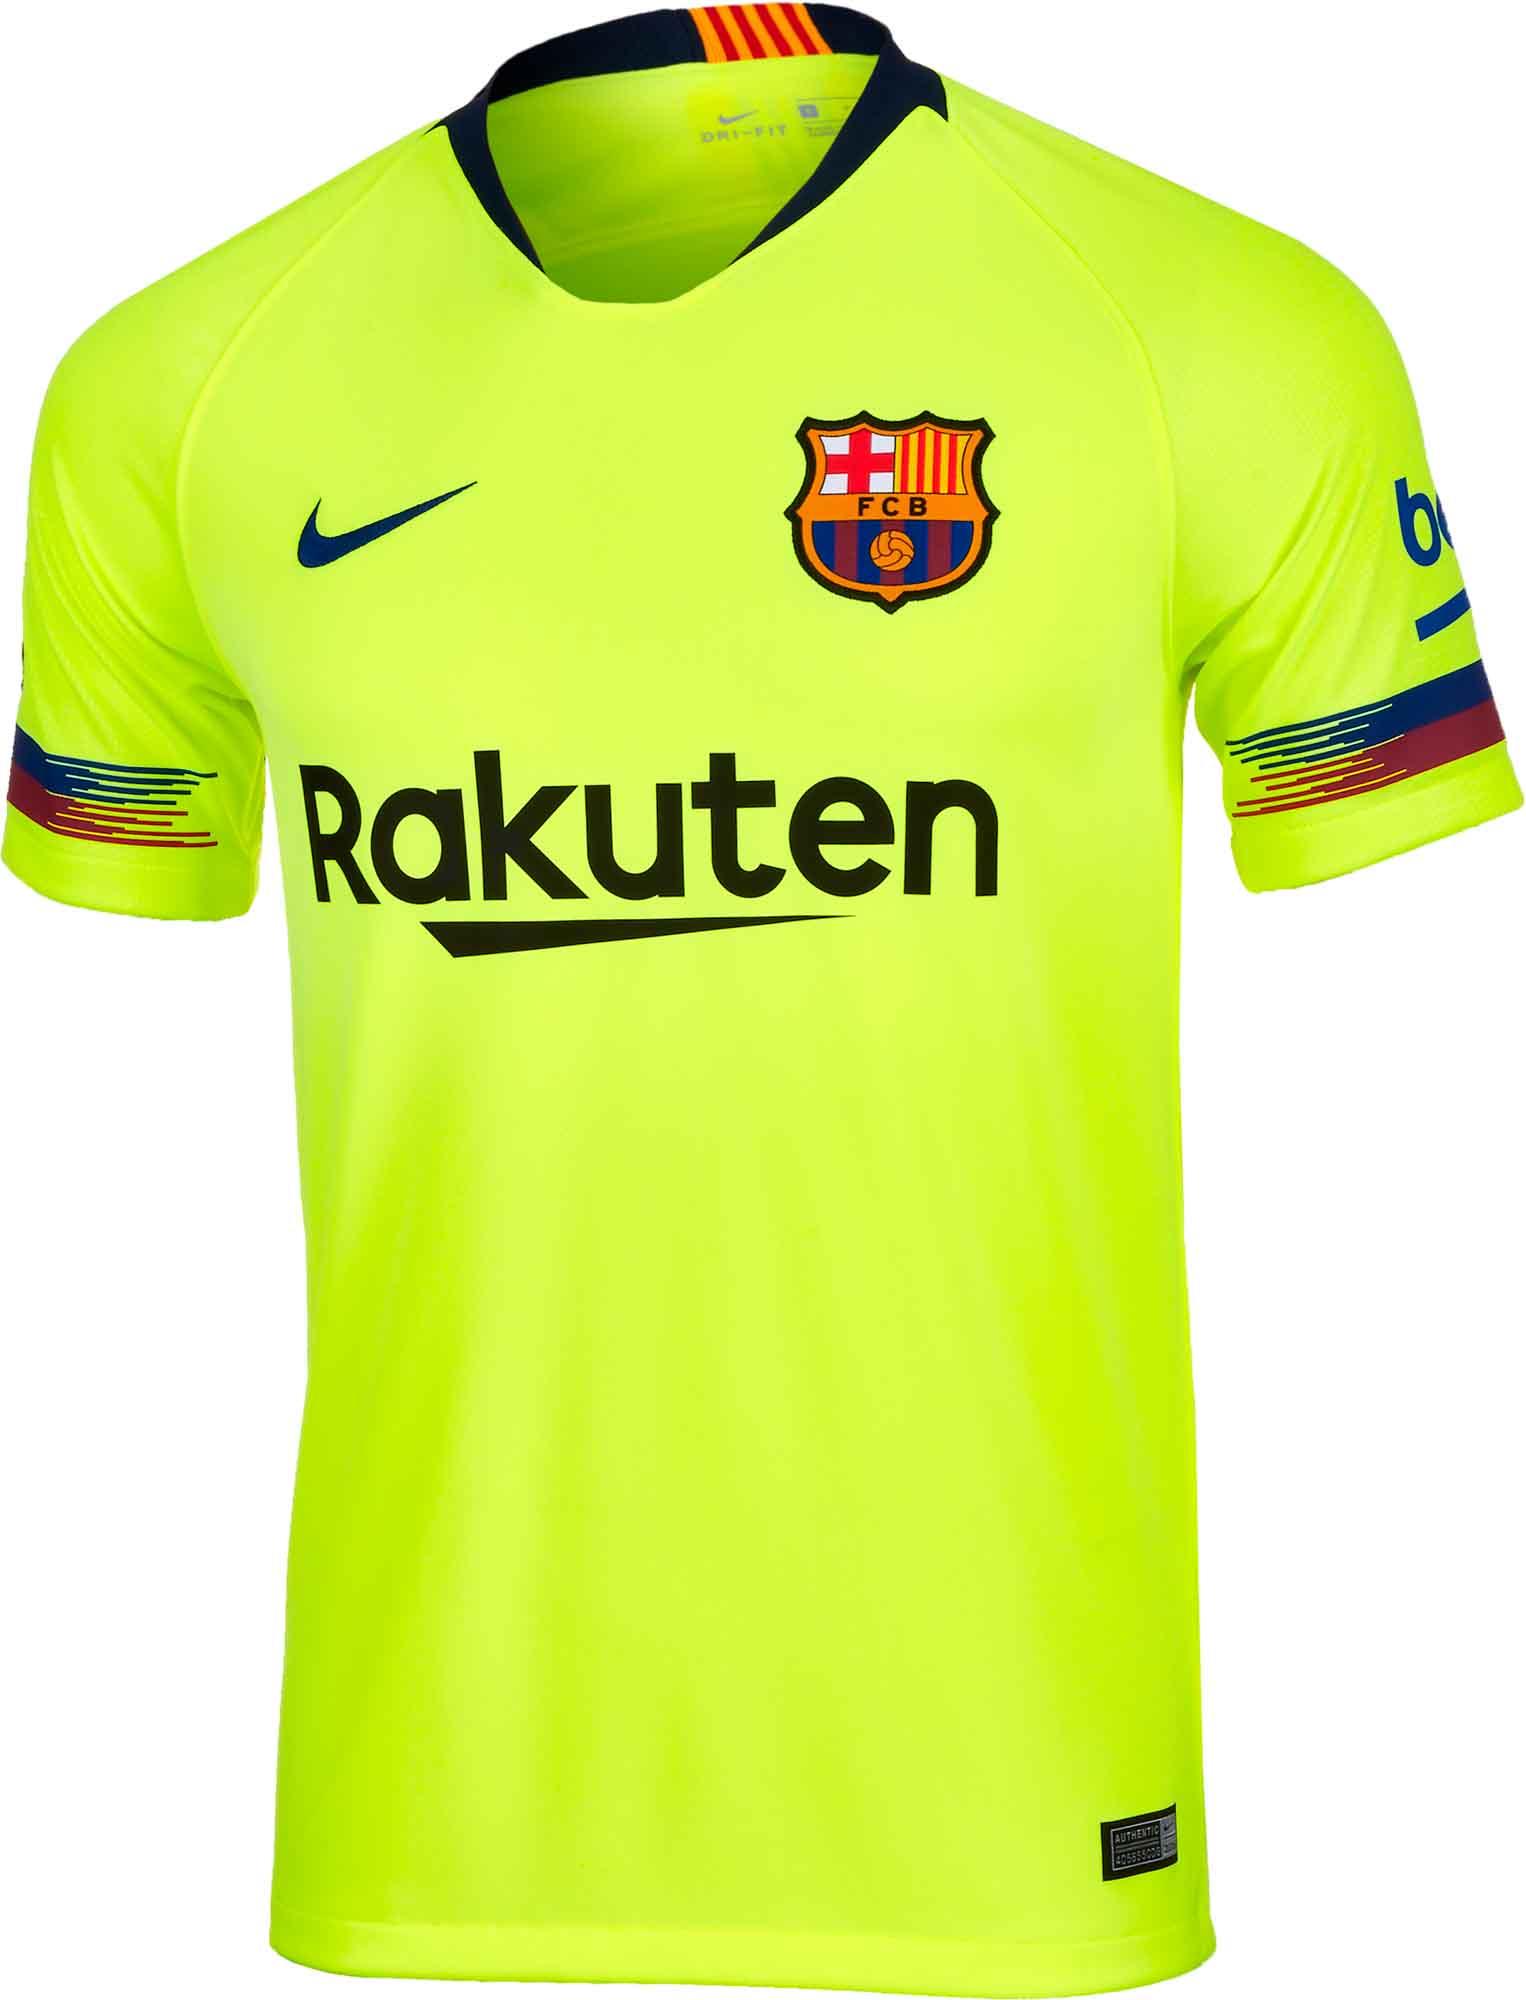 2fc0229b0 ... Club America Home Soccer Jersey 2018-2019. Uhlsport Match Football Kit  · Barcelona ...